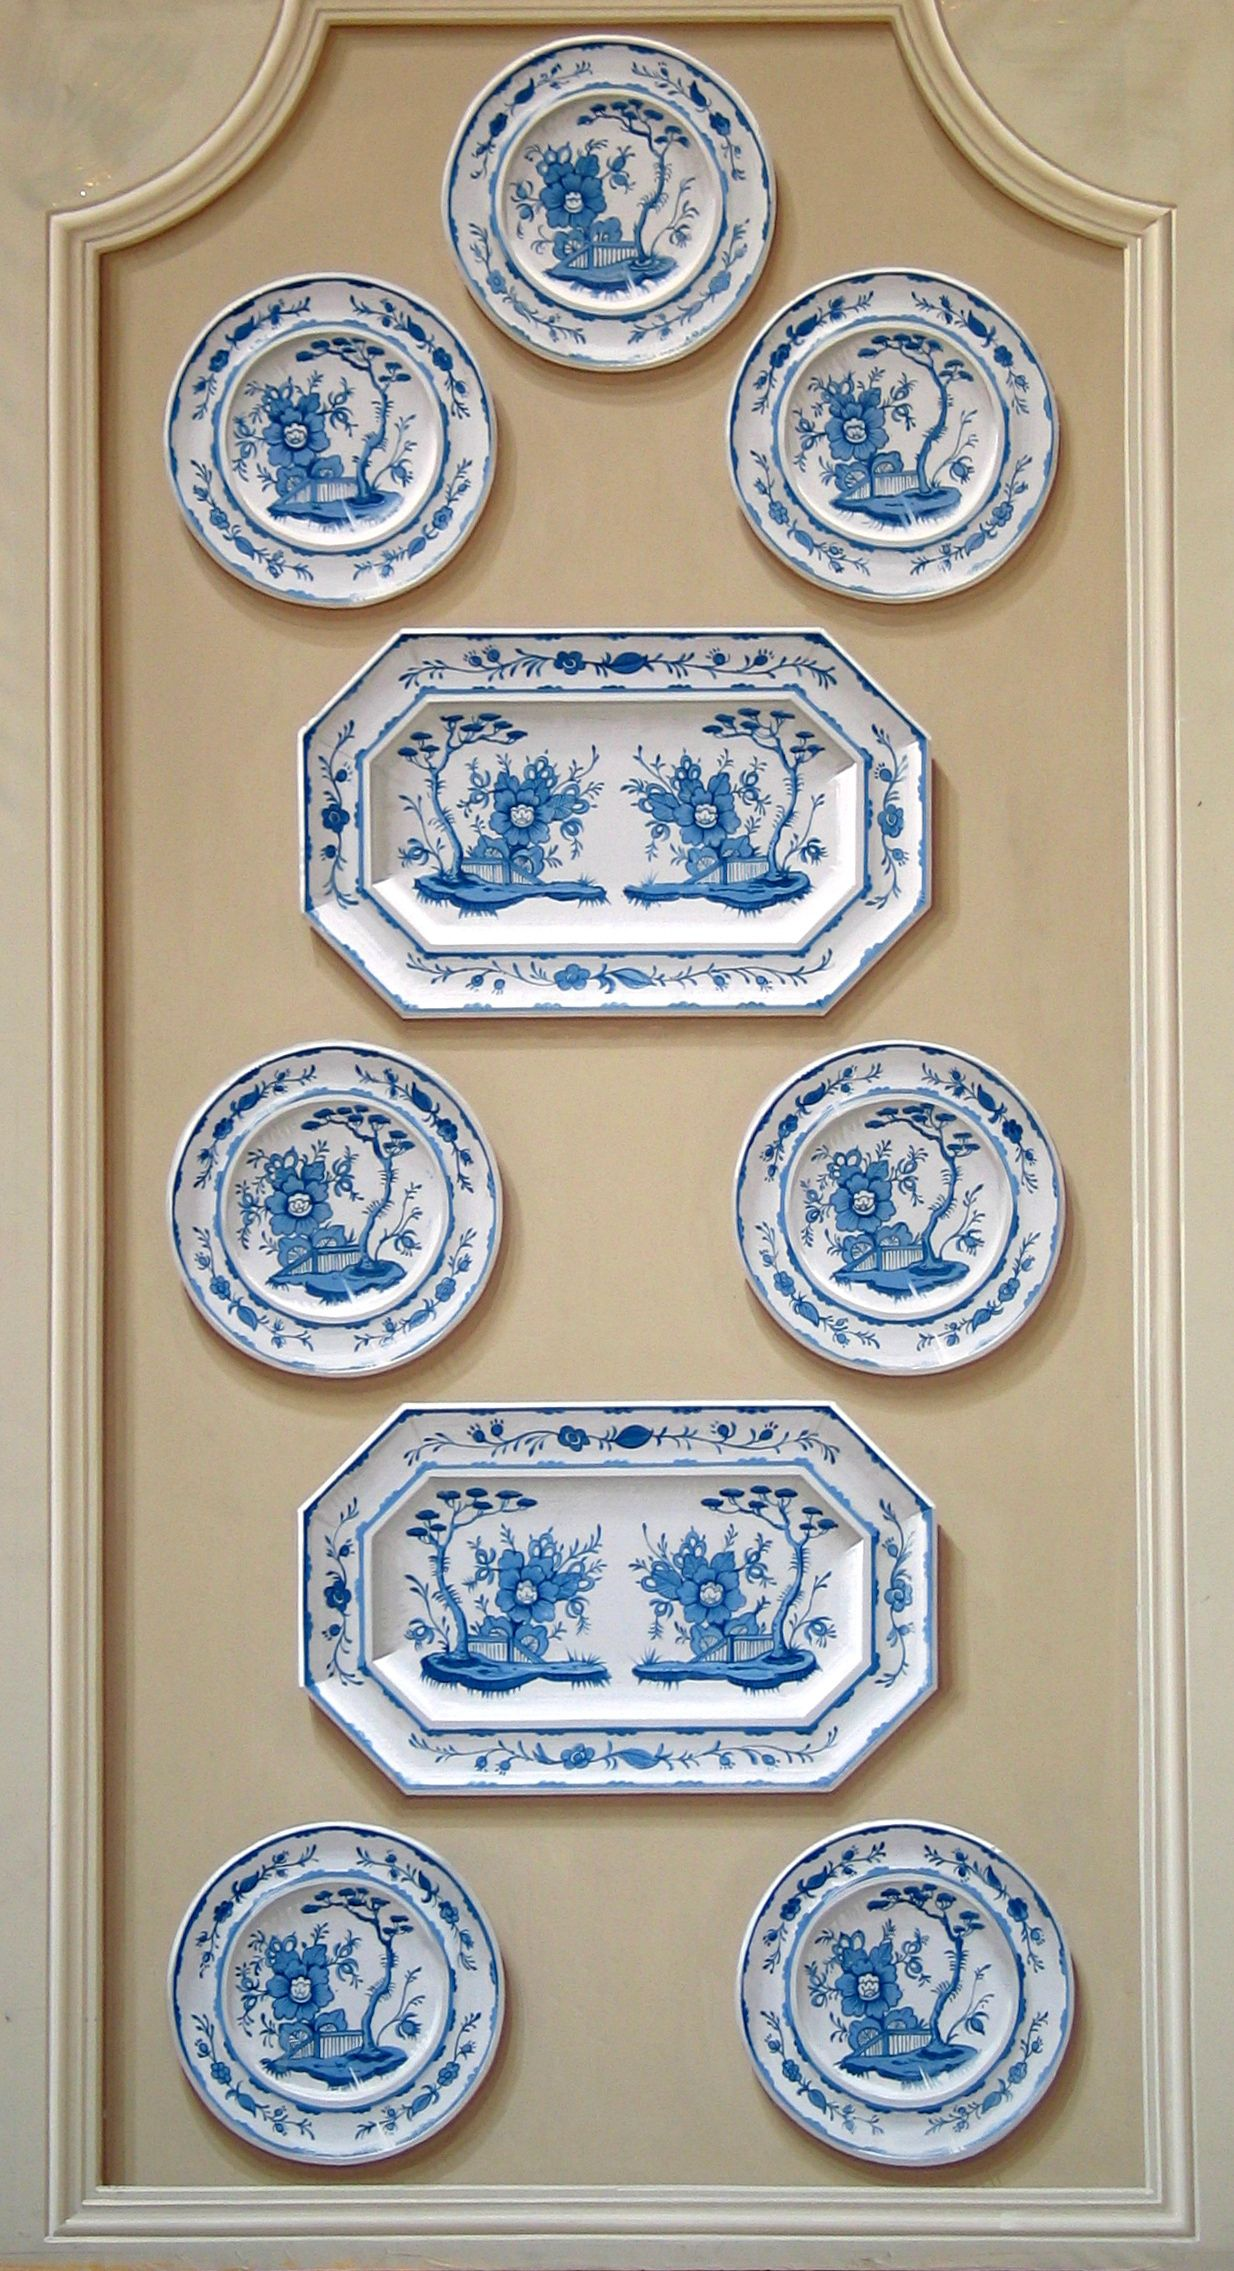 Miniature Printables - Plates panel. •.......................  ................................♥...Nims...♥